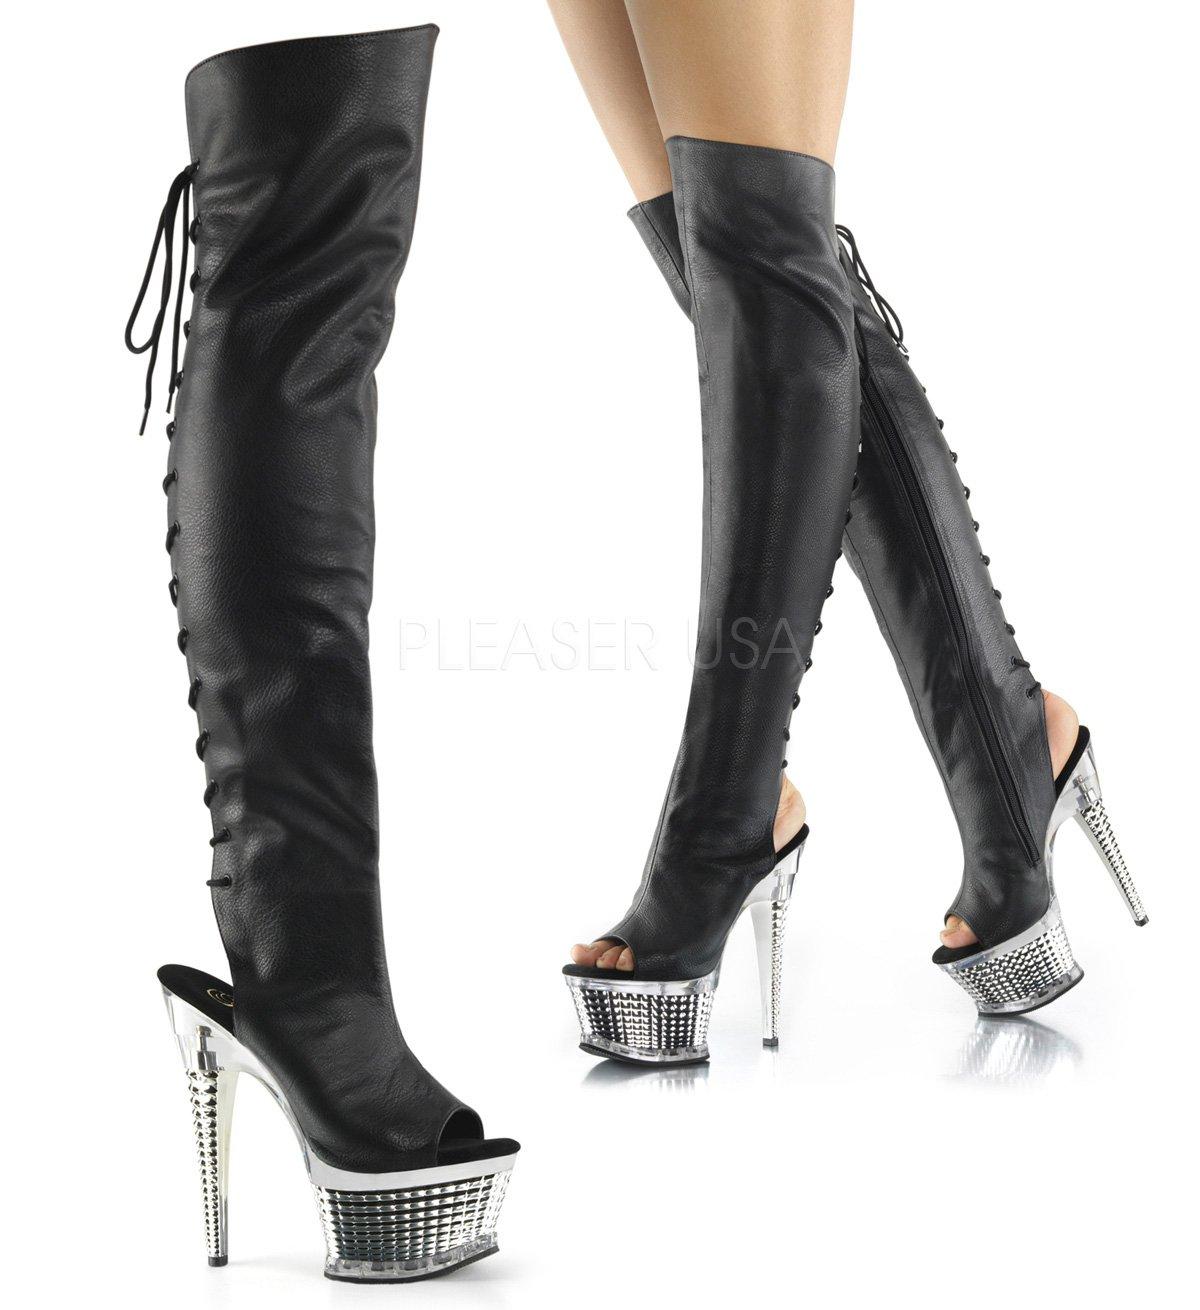 Pleaser Women's Illusion-3019 Over The Knee Boot B01M65PRQR 12 B(M) US|Blk Pu/Slv Chrome